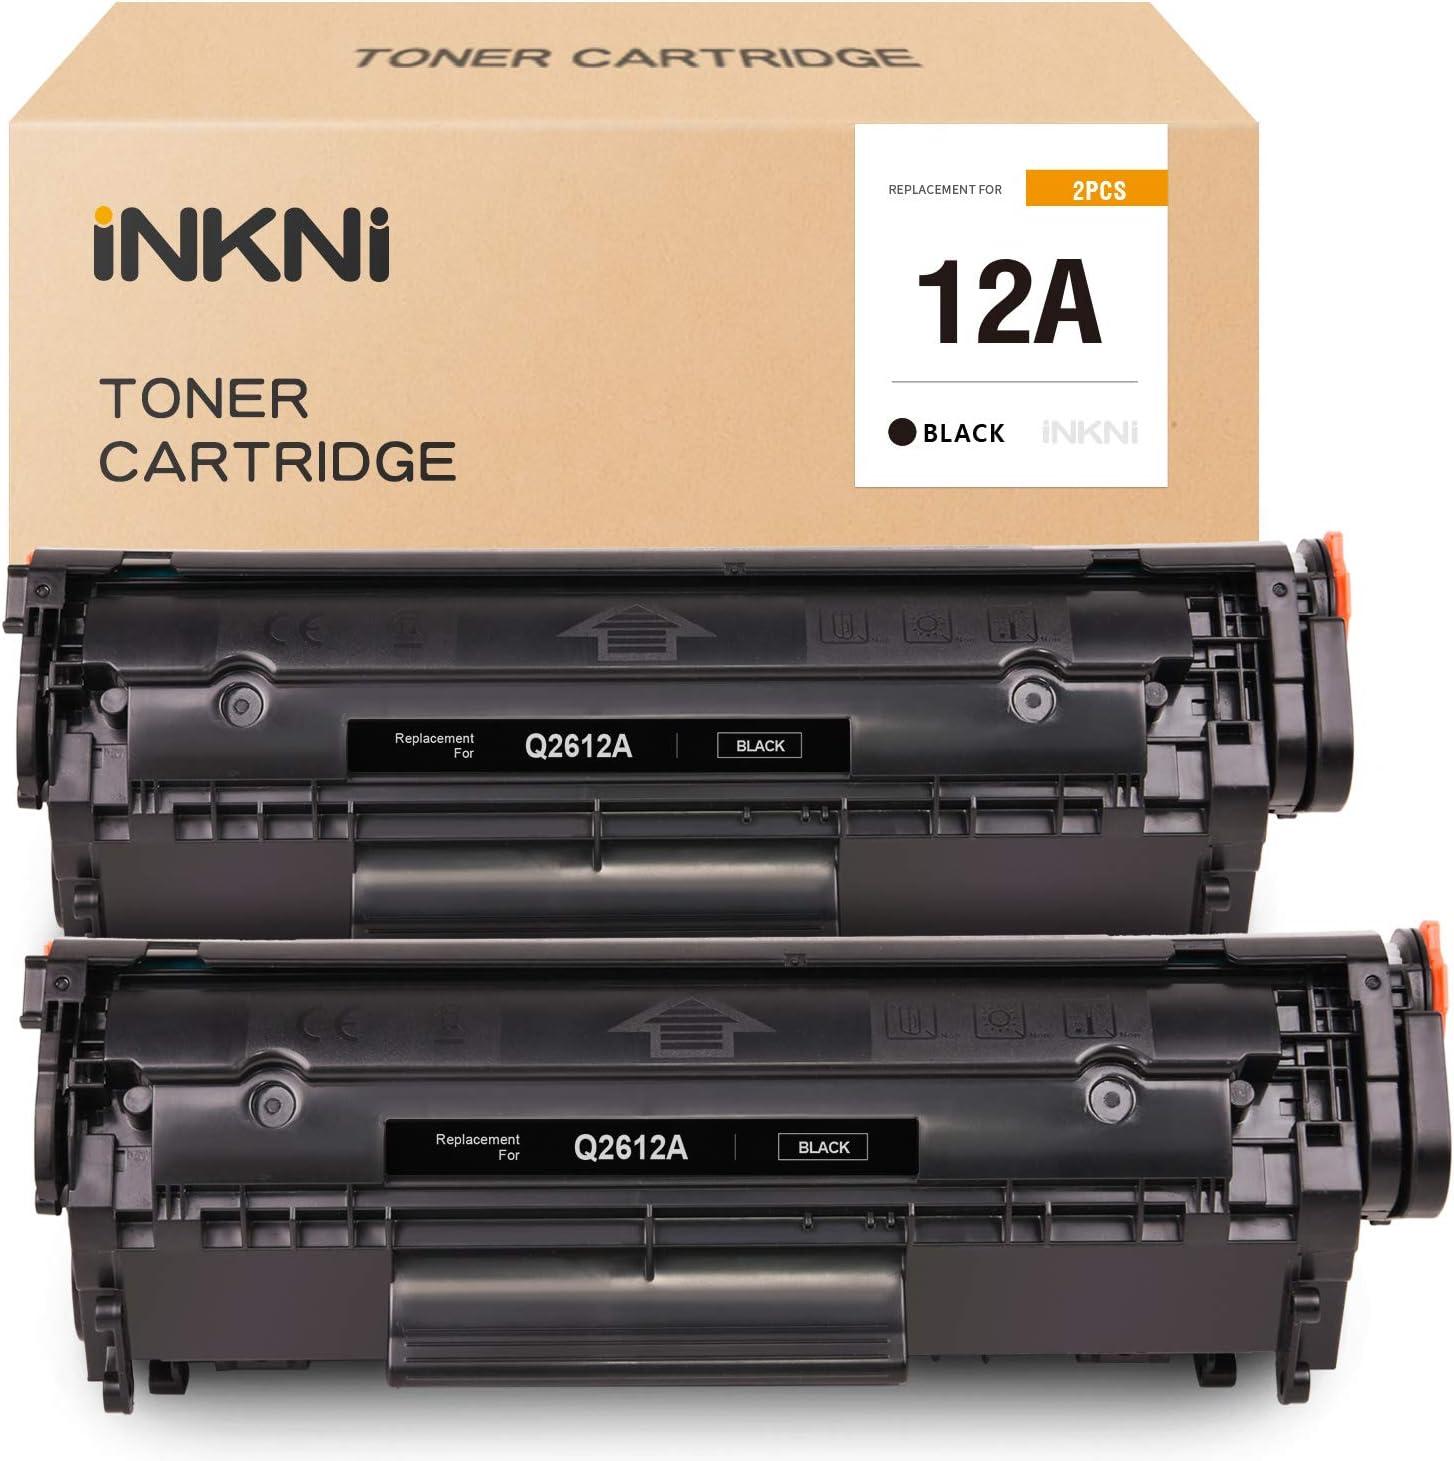 INKNI Compatible Toner Cartridge Replacement for HP 12A Q2612A for HP 1010 1020 3050 1022 1018 3015 1022n 3055 1015 3030 3052 1012 1022nw 3020 3050z M1319 M1319f (Black, 2-Pack)